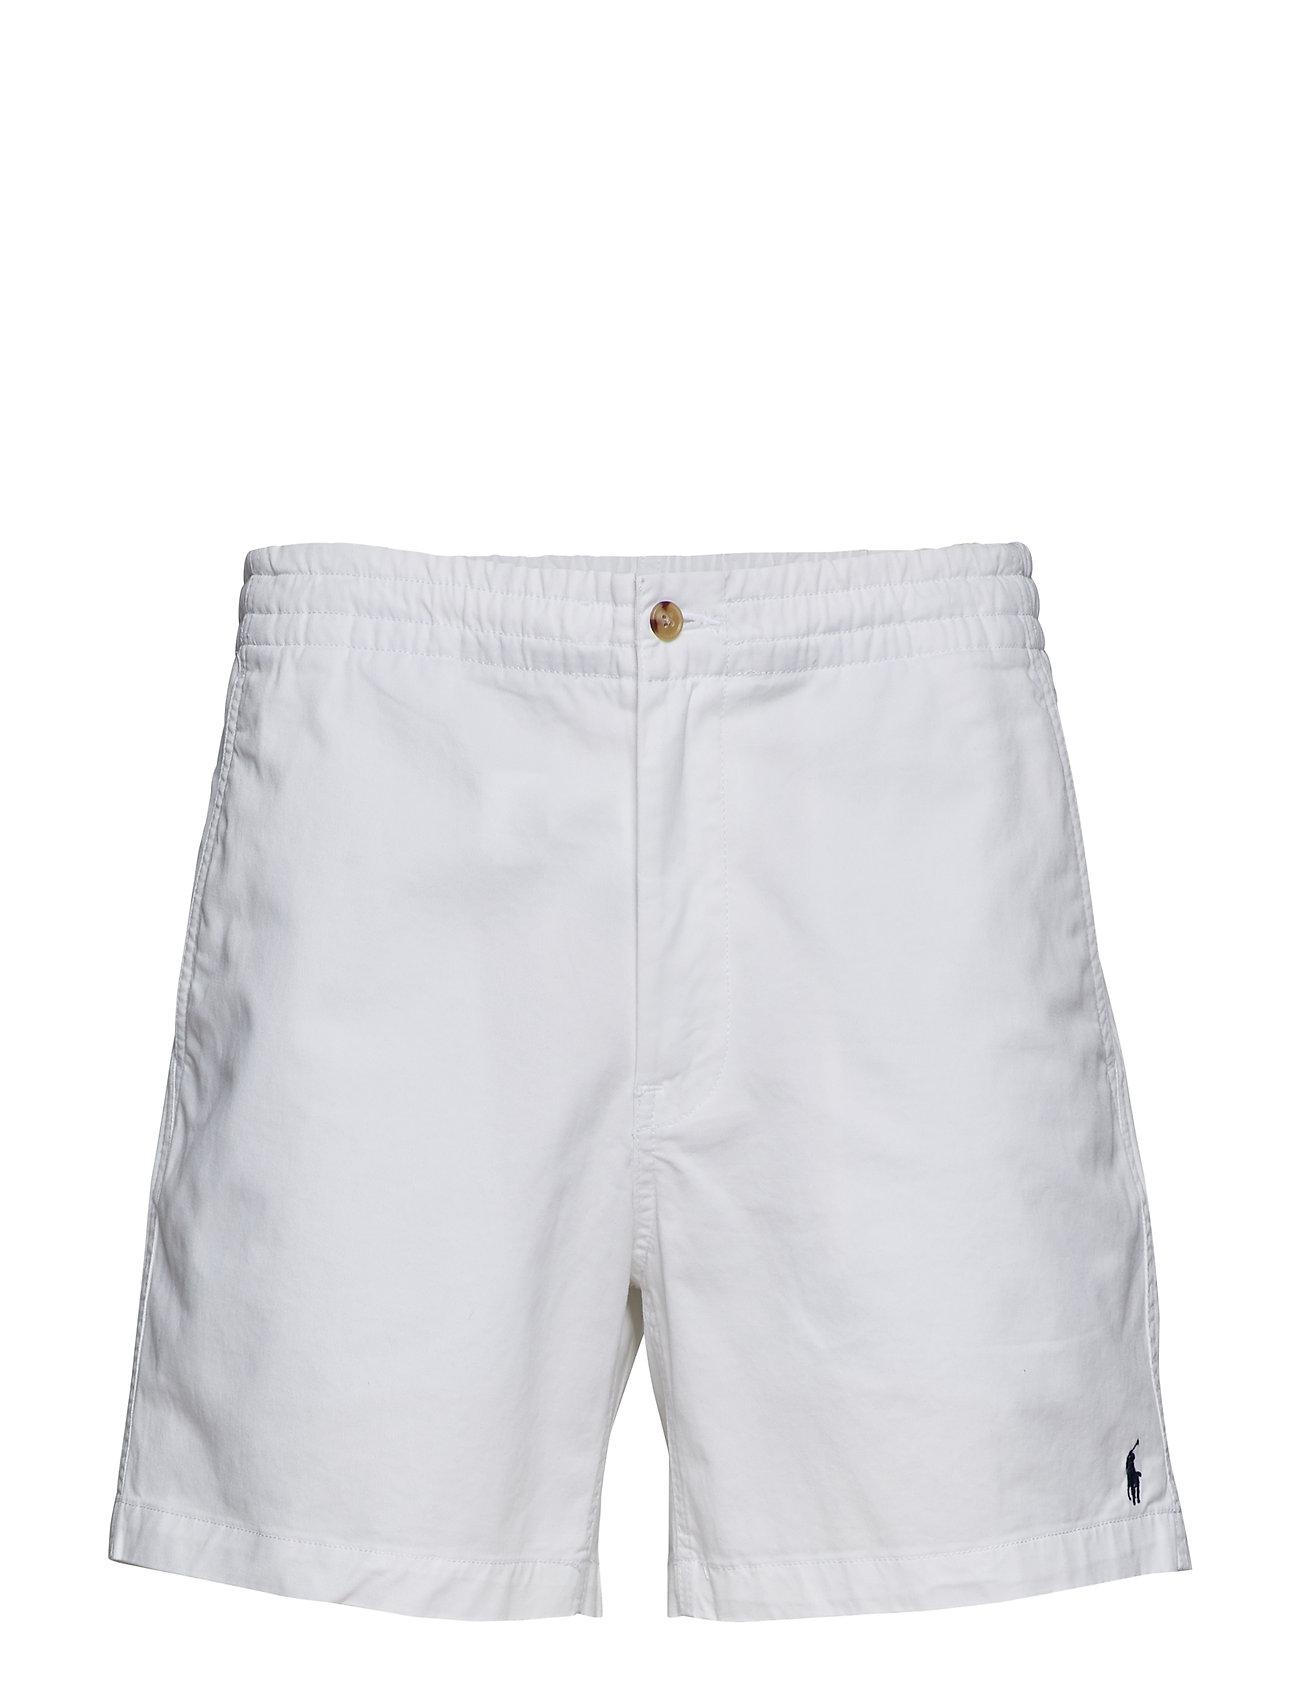 Polo Ralph Lauren CFPREPSTER6S-FLAT-SHORT - WHITE